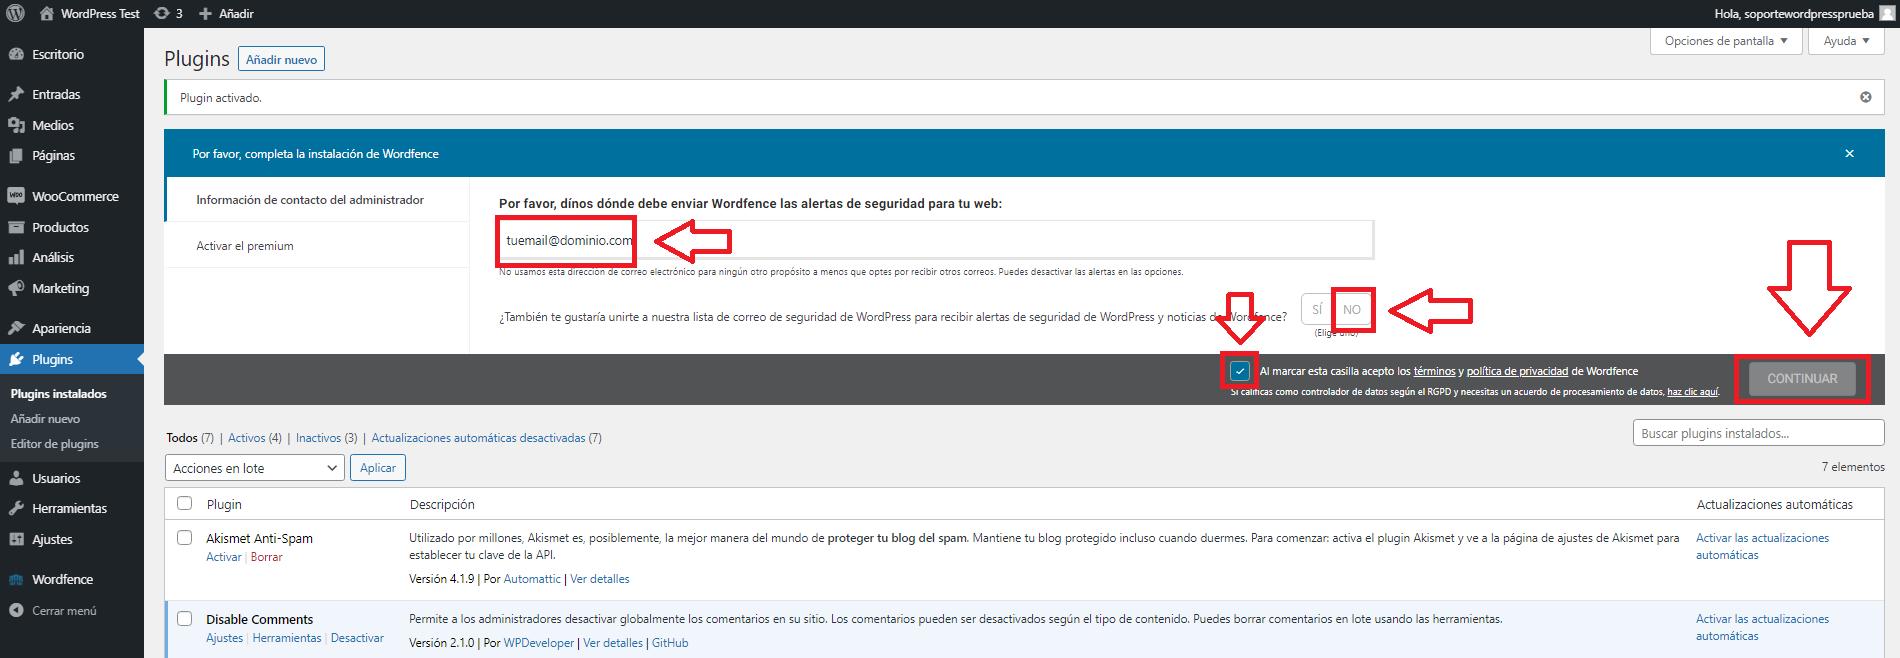 instalar wordfence en tu wordpress desde wp-admin